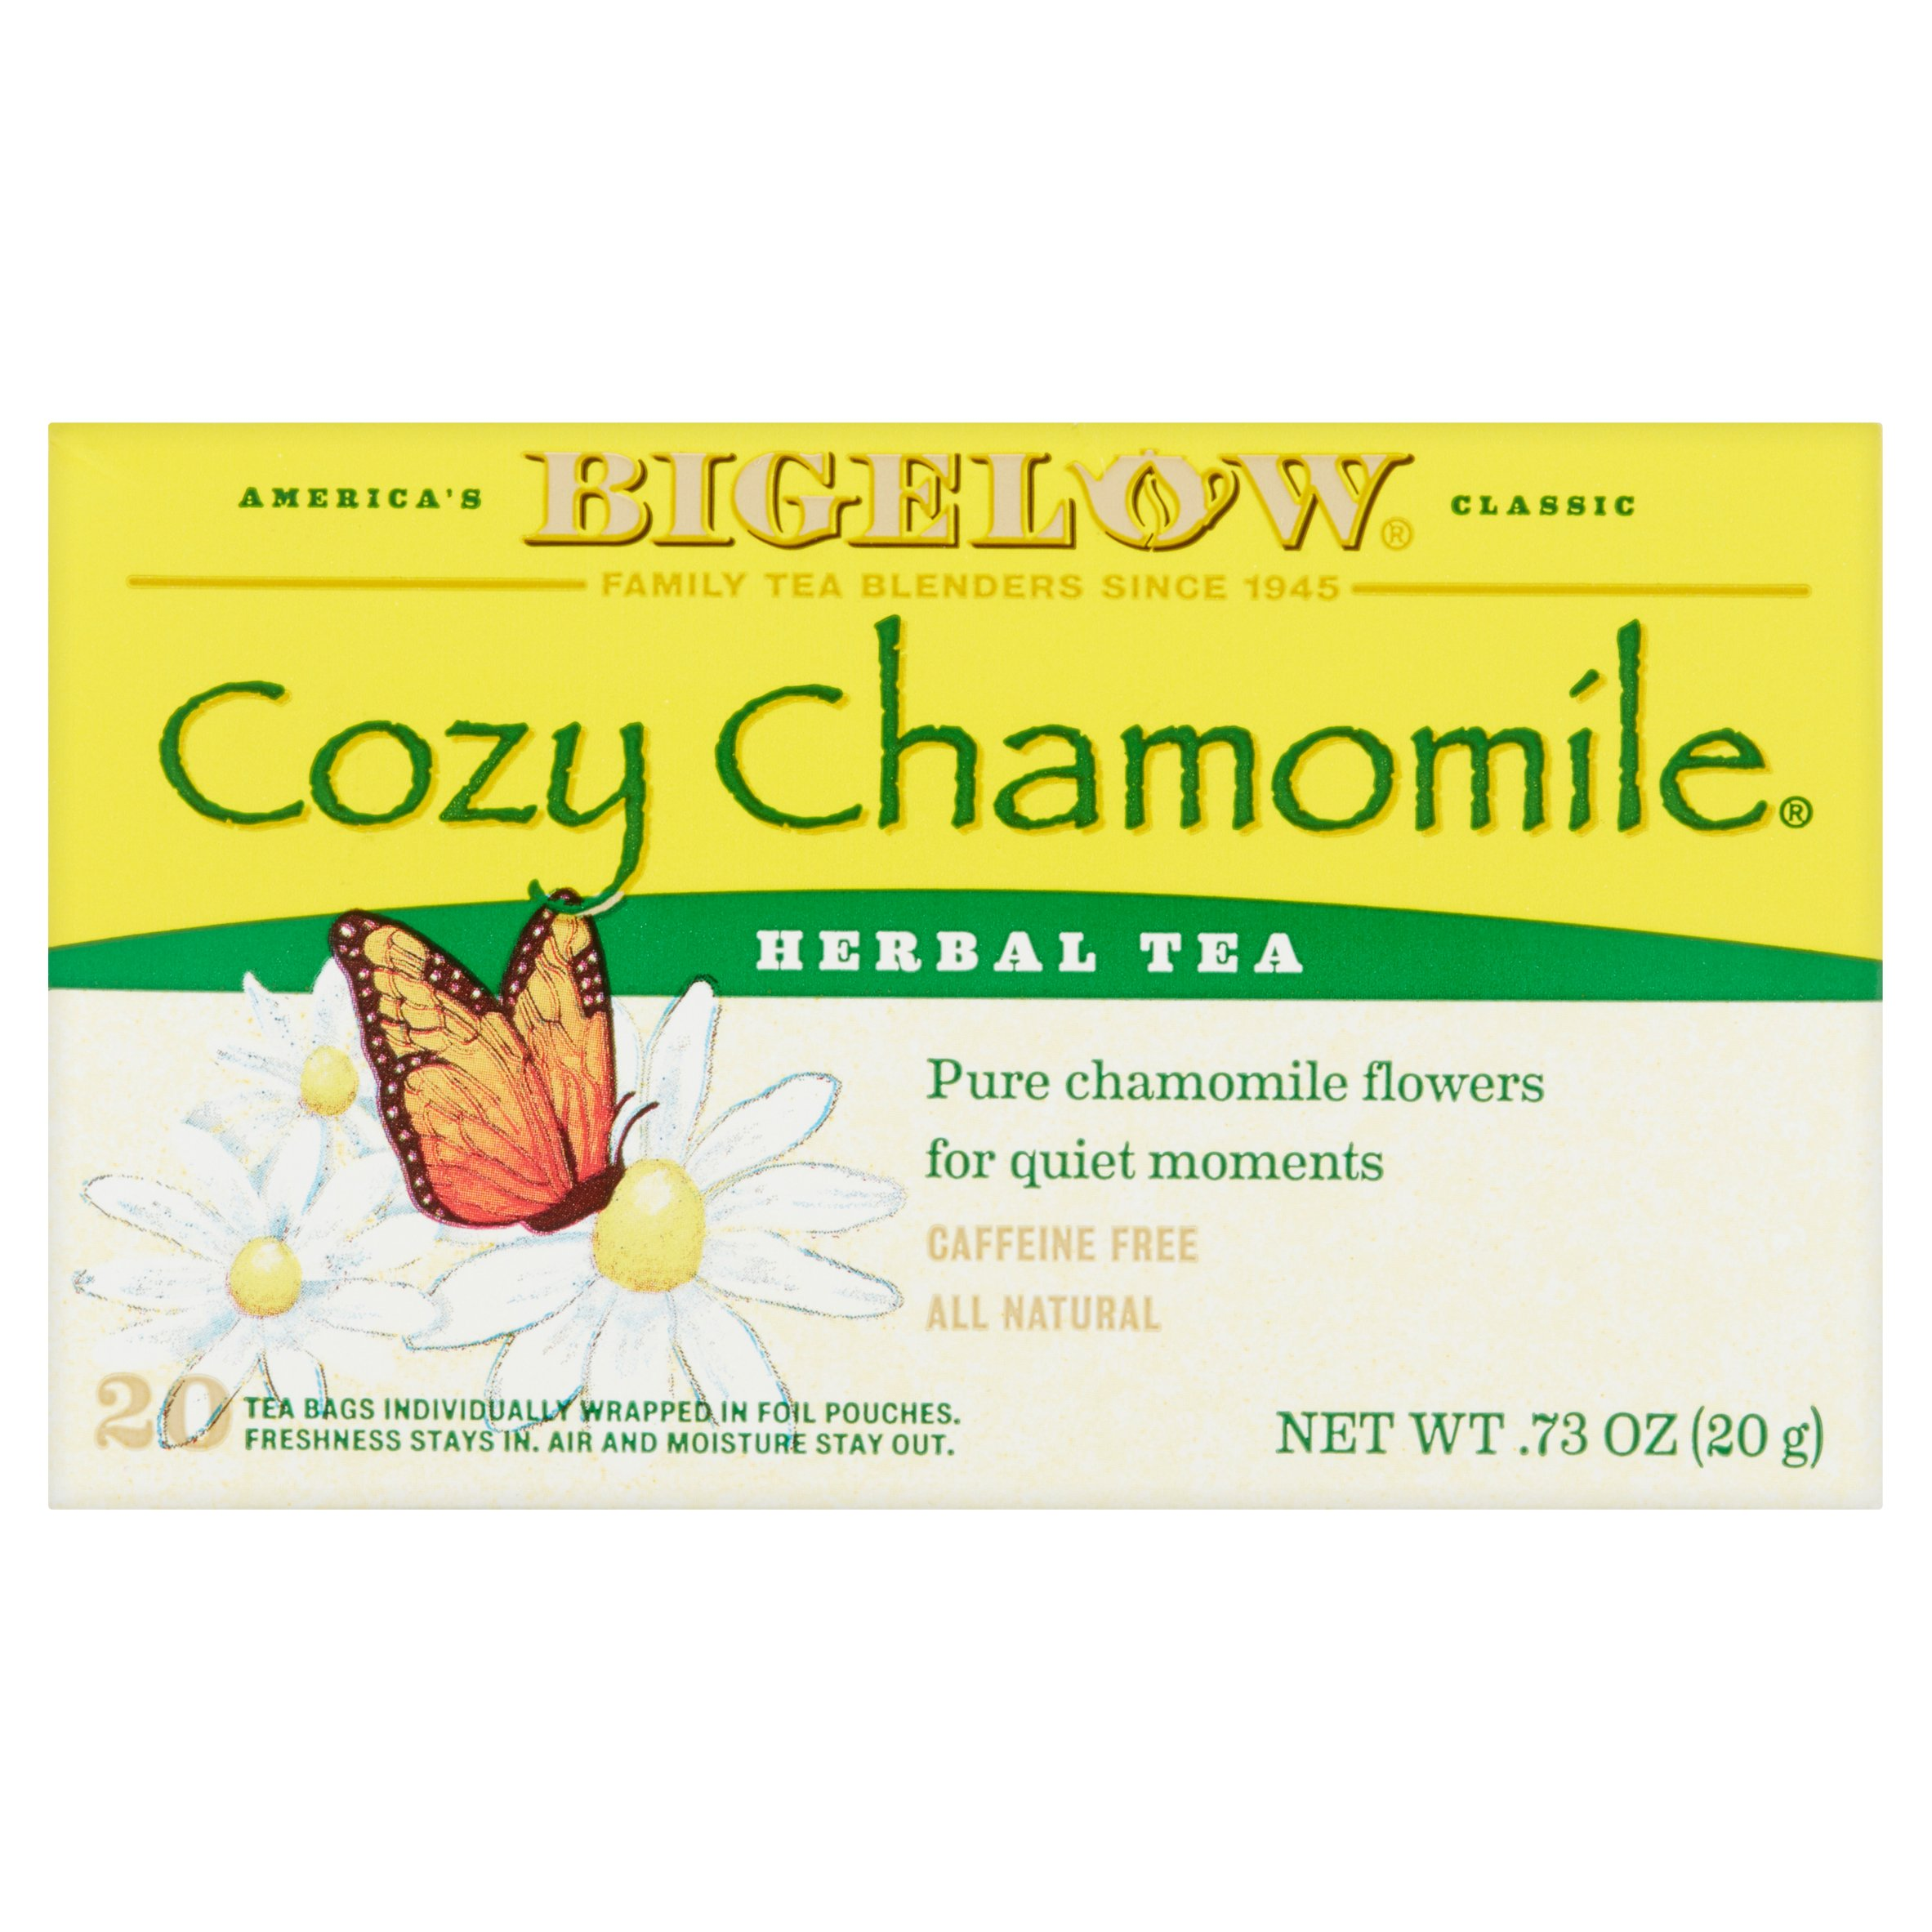 Bigelow Caffeine Free Cozy Chamomile Herbal Tea Bags, 20 ct by RC Bigelow, Inc.